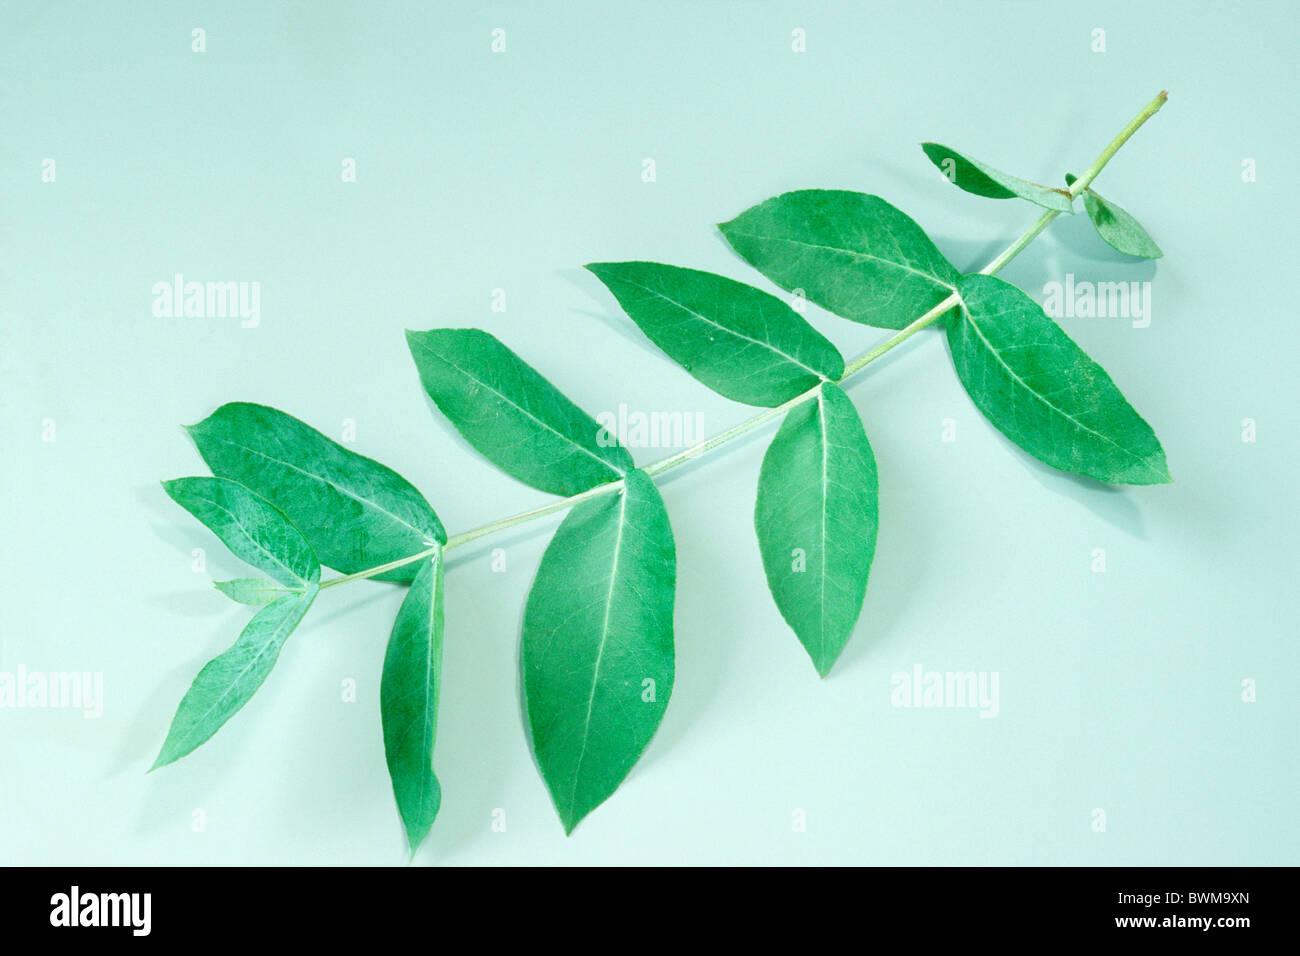 Blue Gum de Tasmania, Blue Gum eucalipto (Eucalyptus globulus), twig con hojas, studio picture. Imagen De Stock